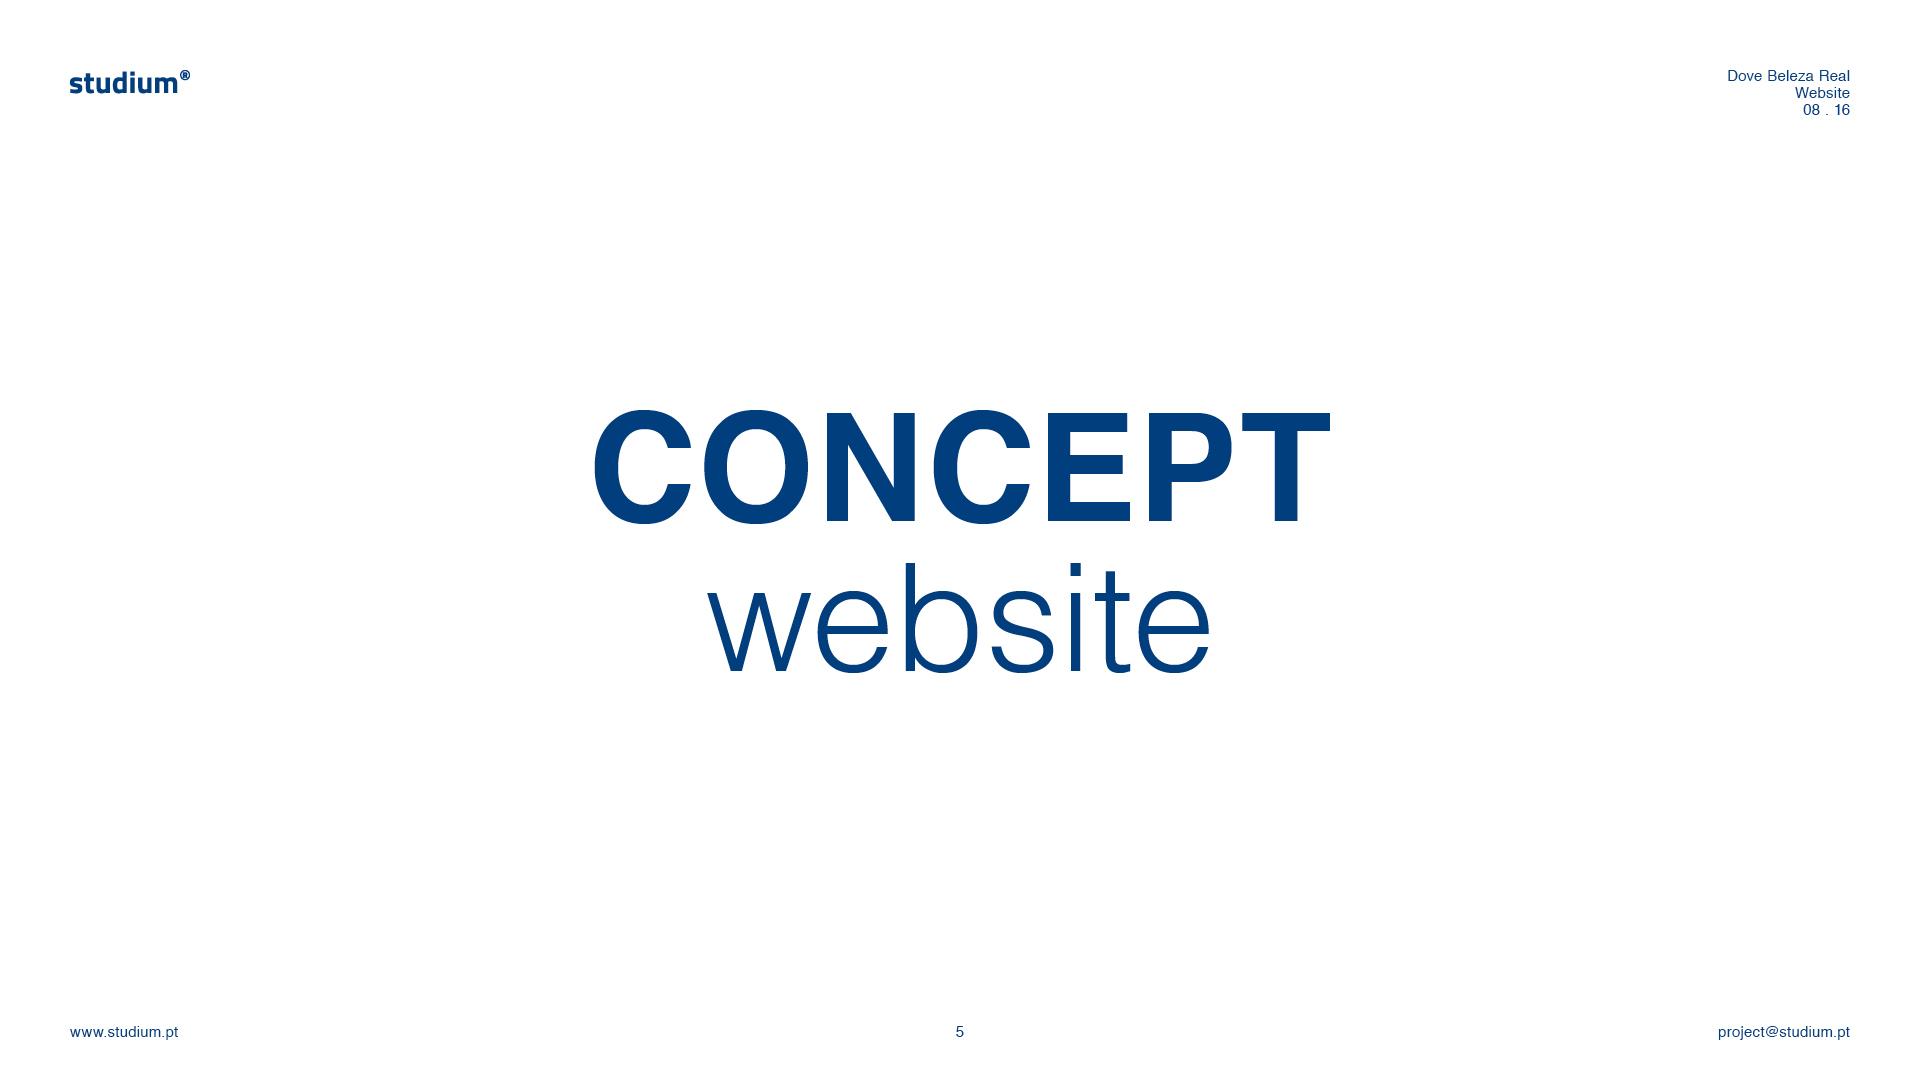 WEB20150063-DOVEBELEZAREAL-Website-Presentation-T-PU.05